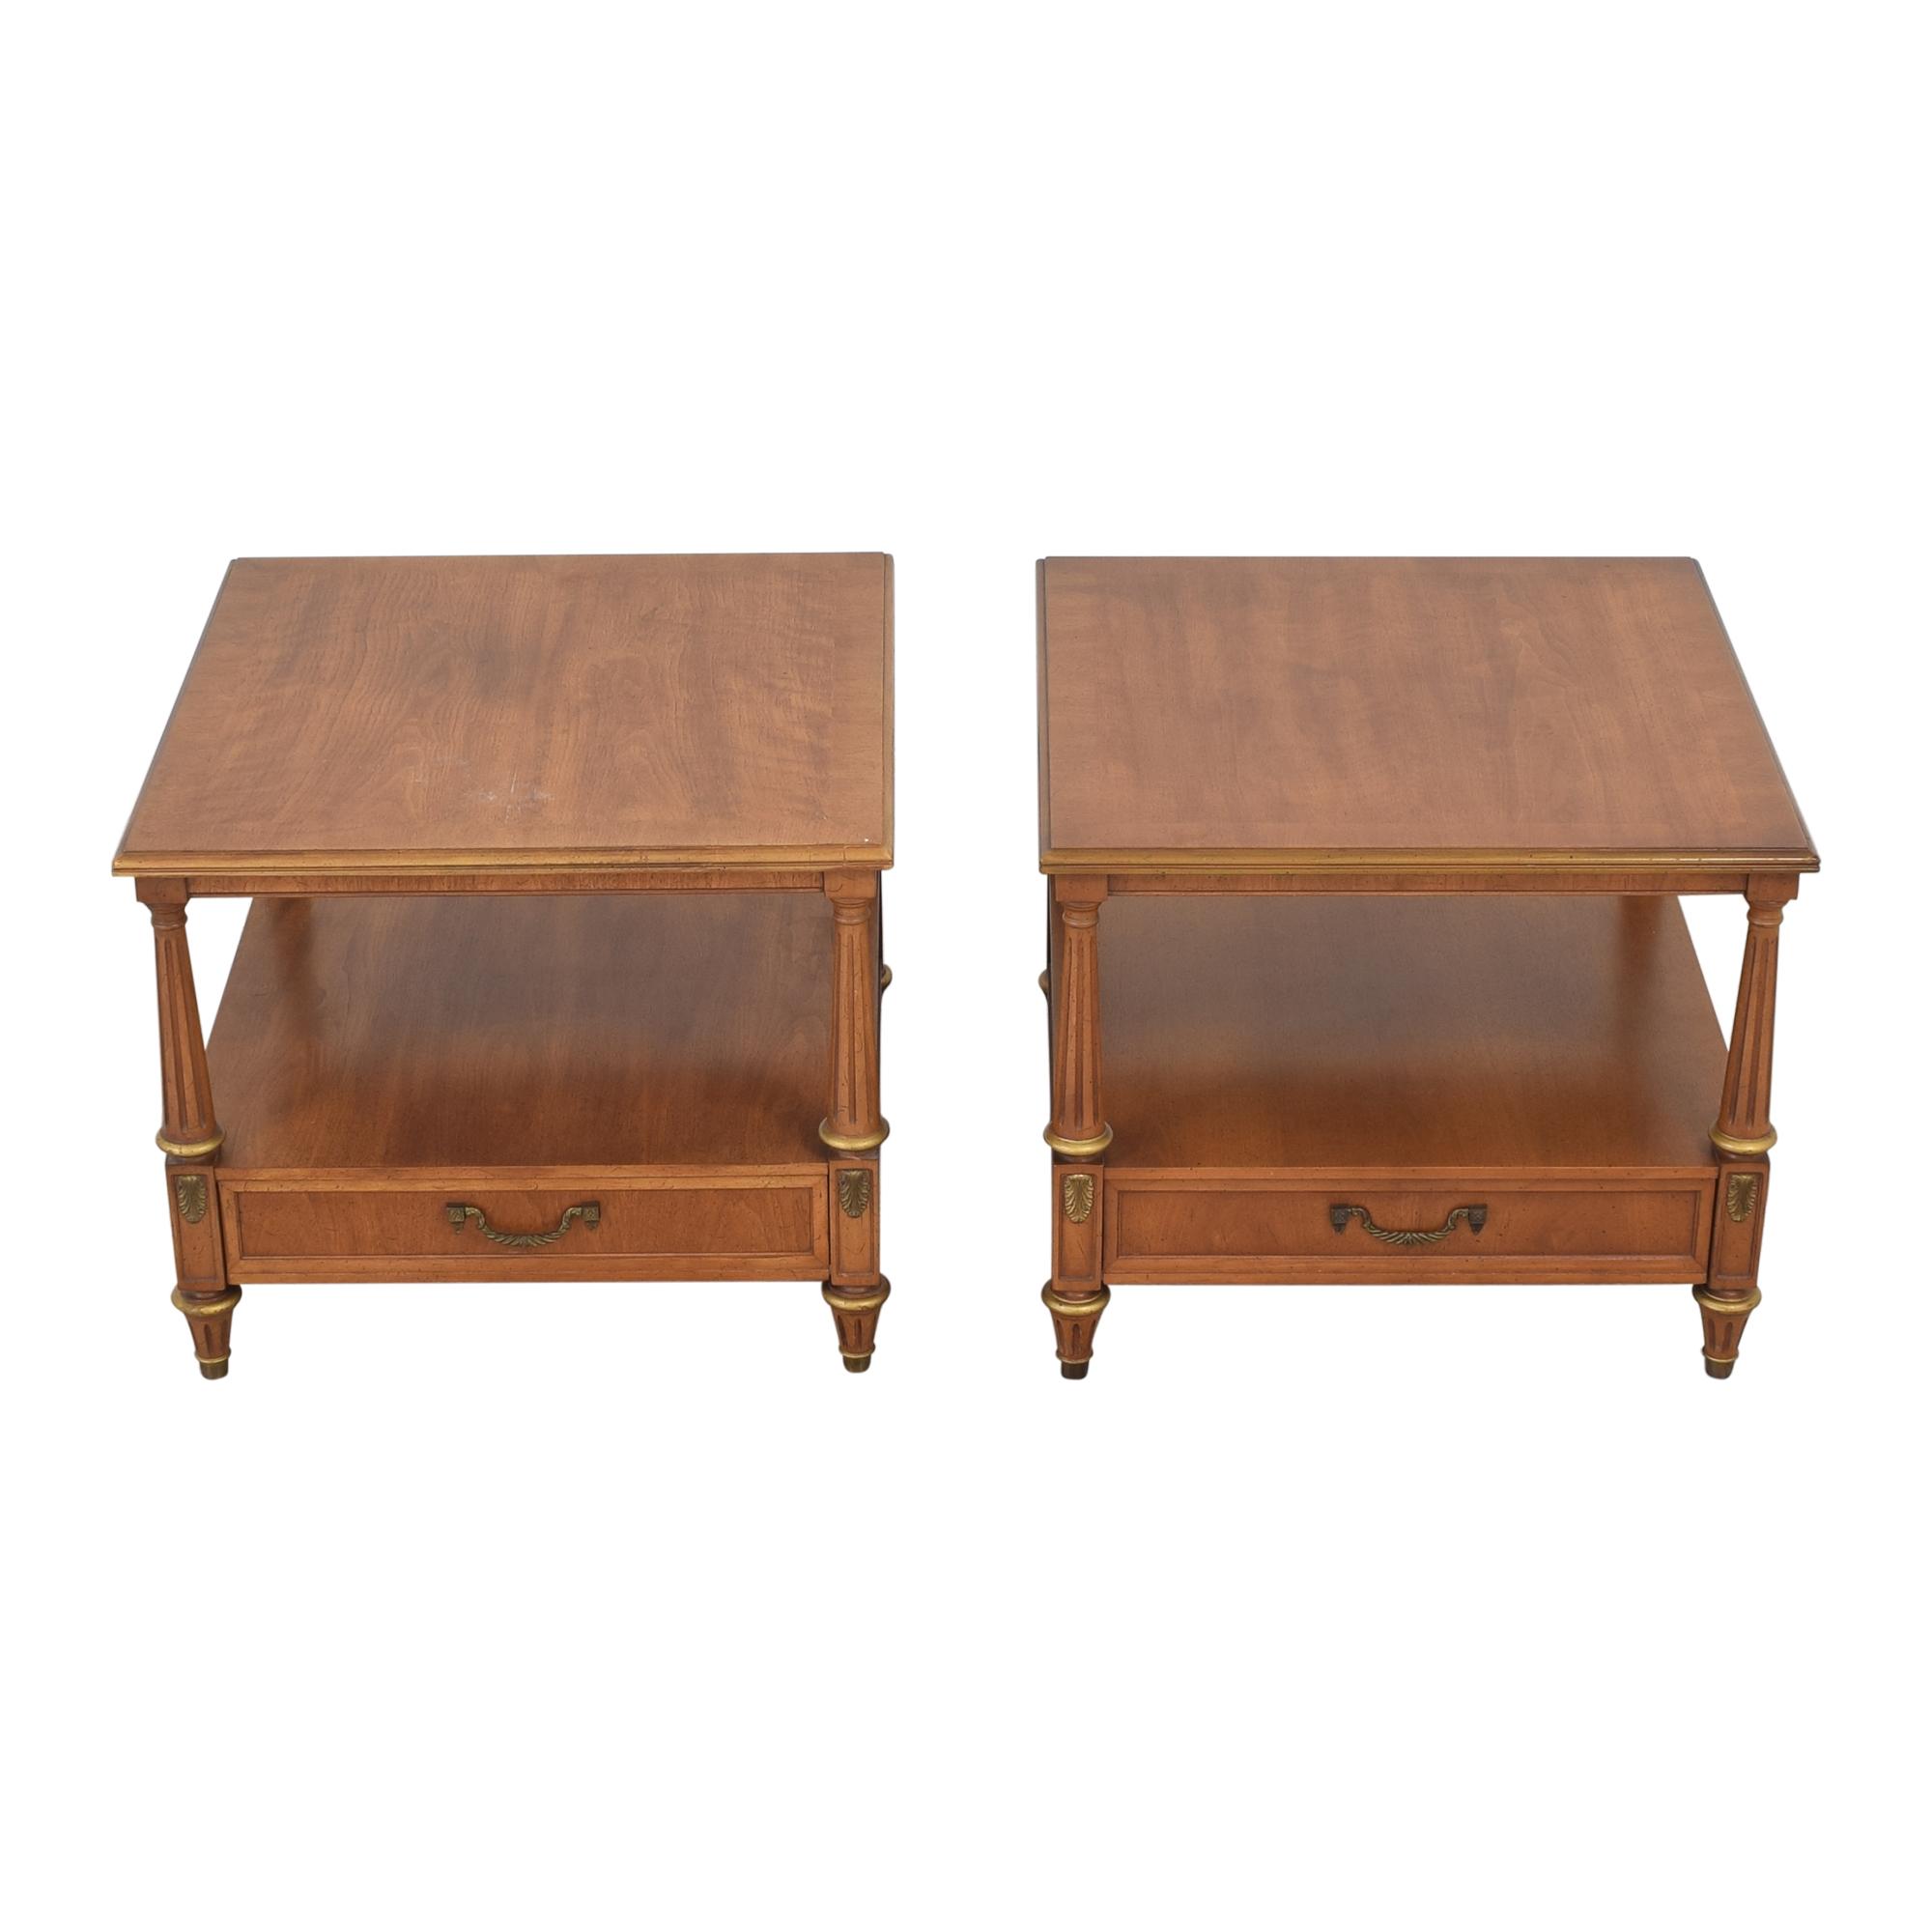 Henredon Furniture Henredon Two Tier End Tables discount